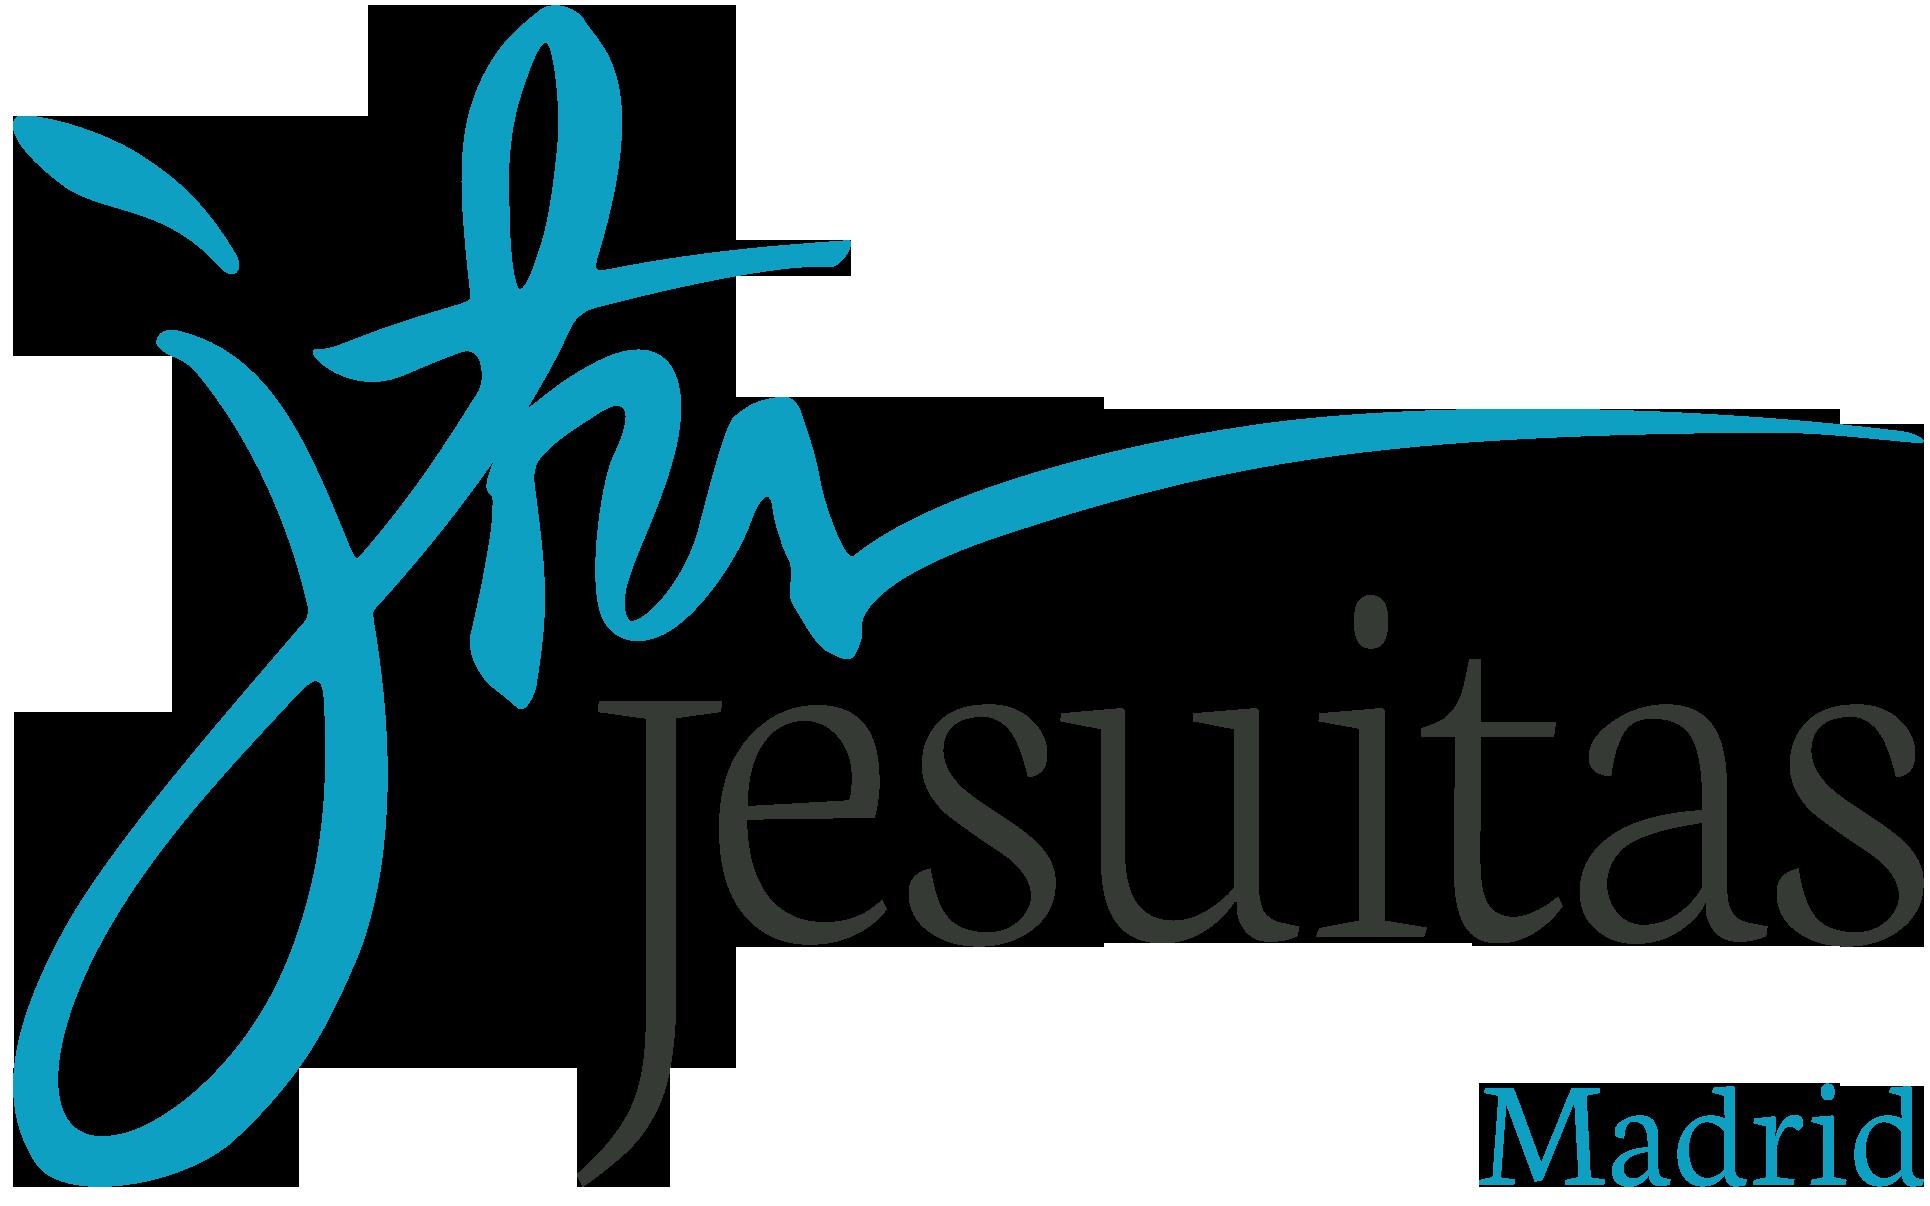 jesuitas.madrid_color